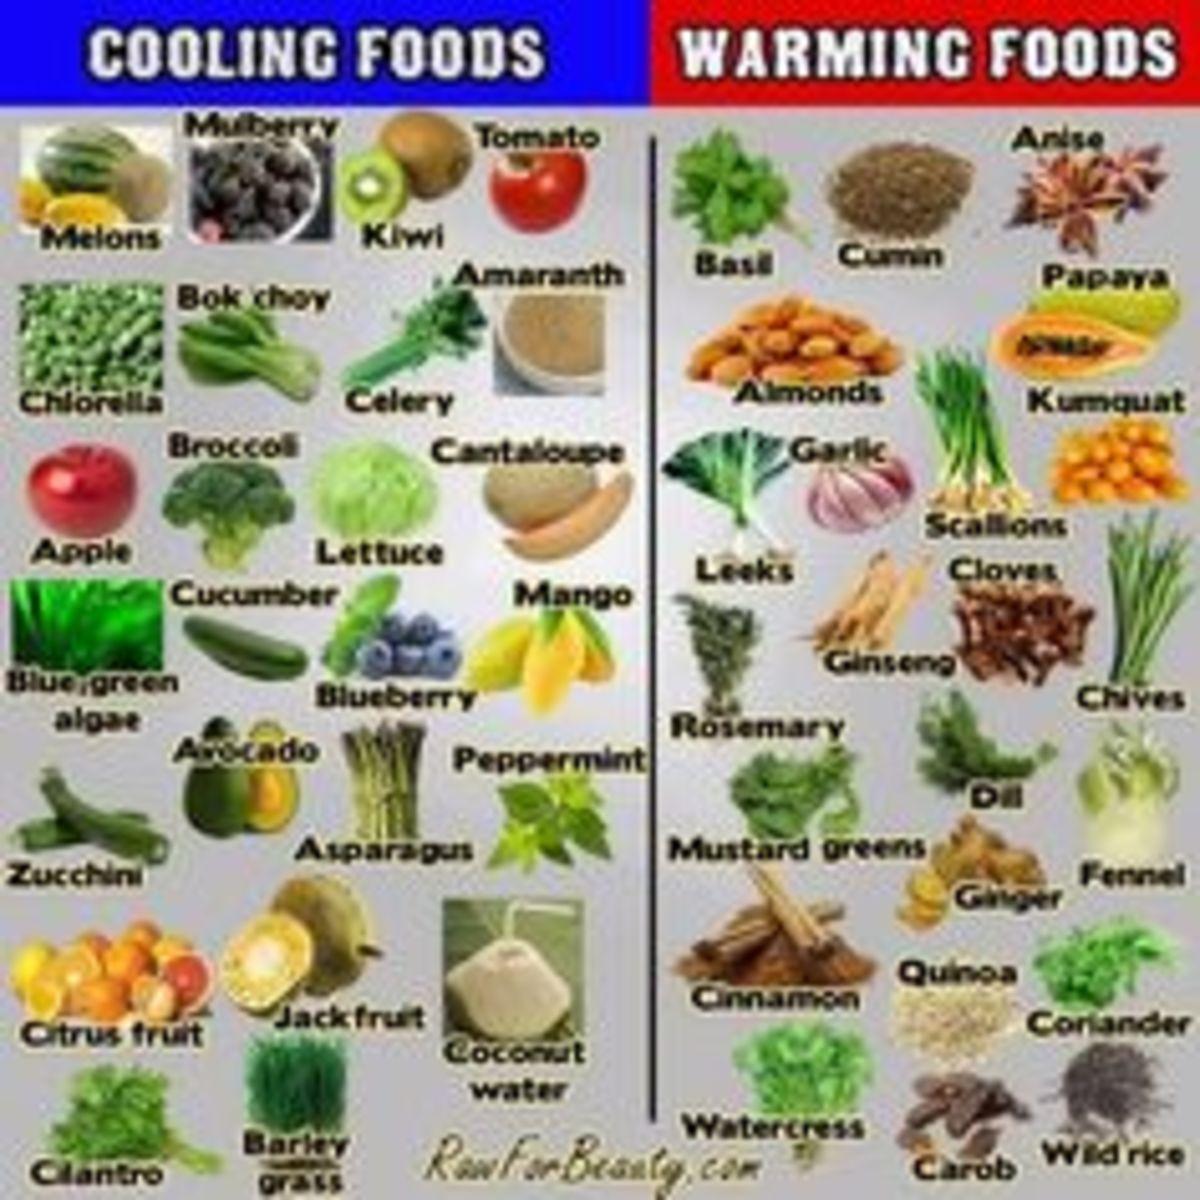 Cooling foods vs. warming foods